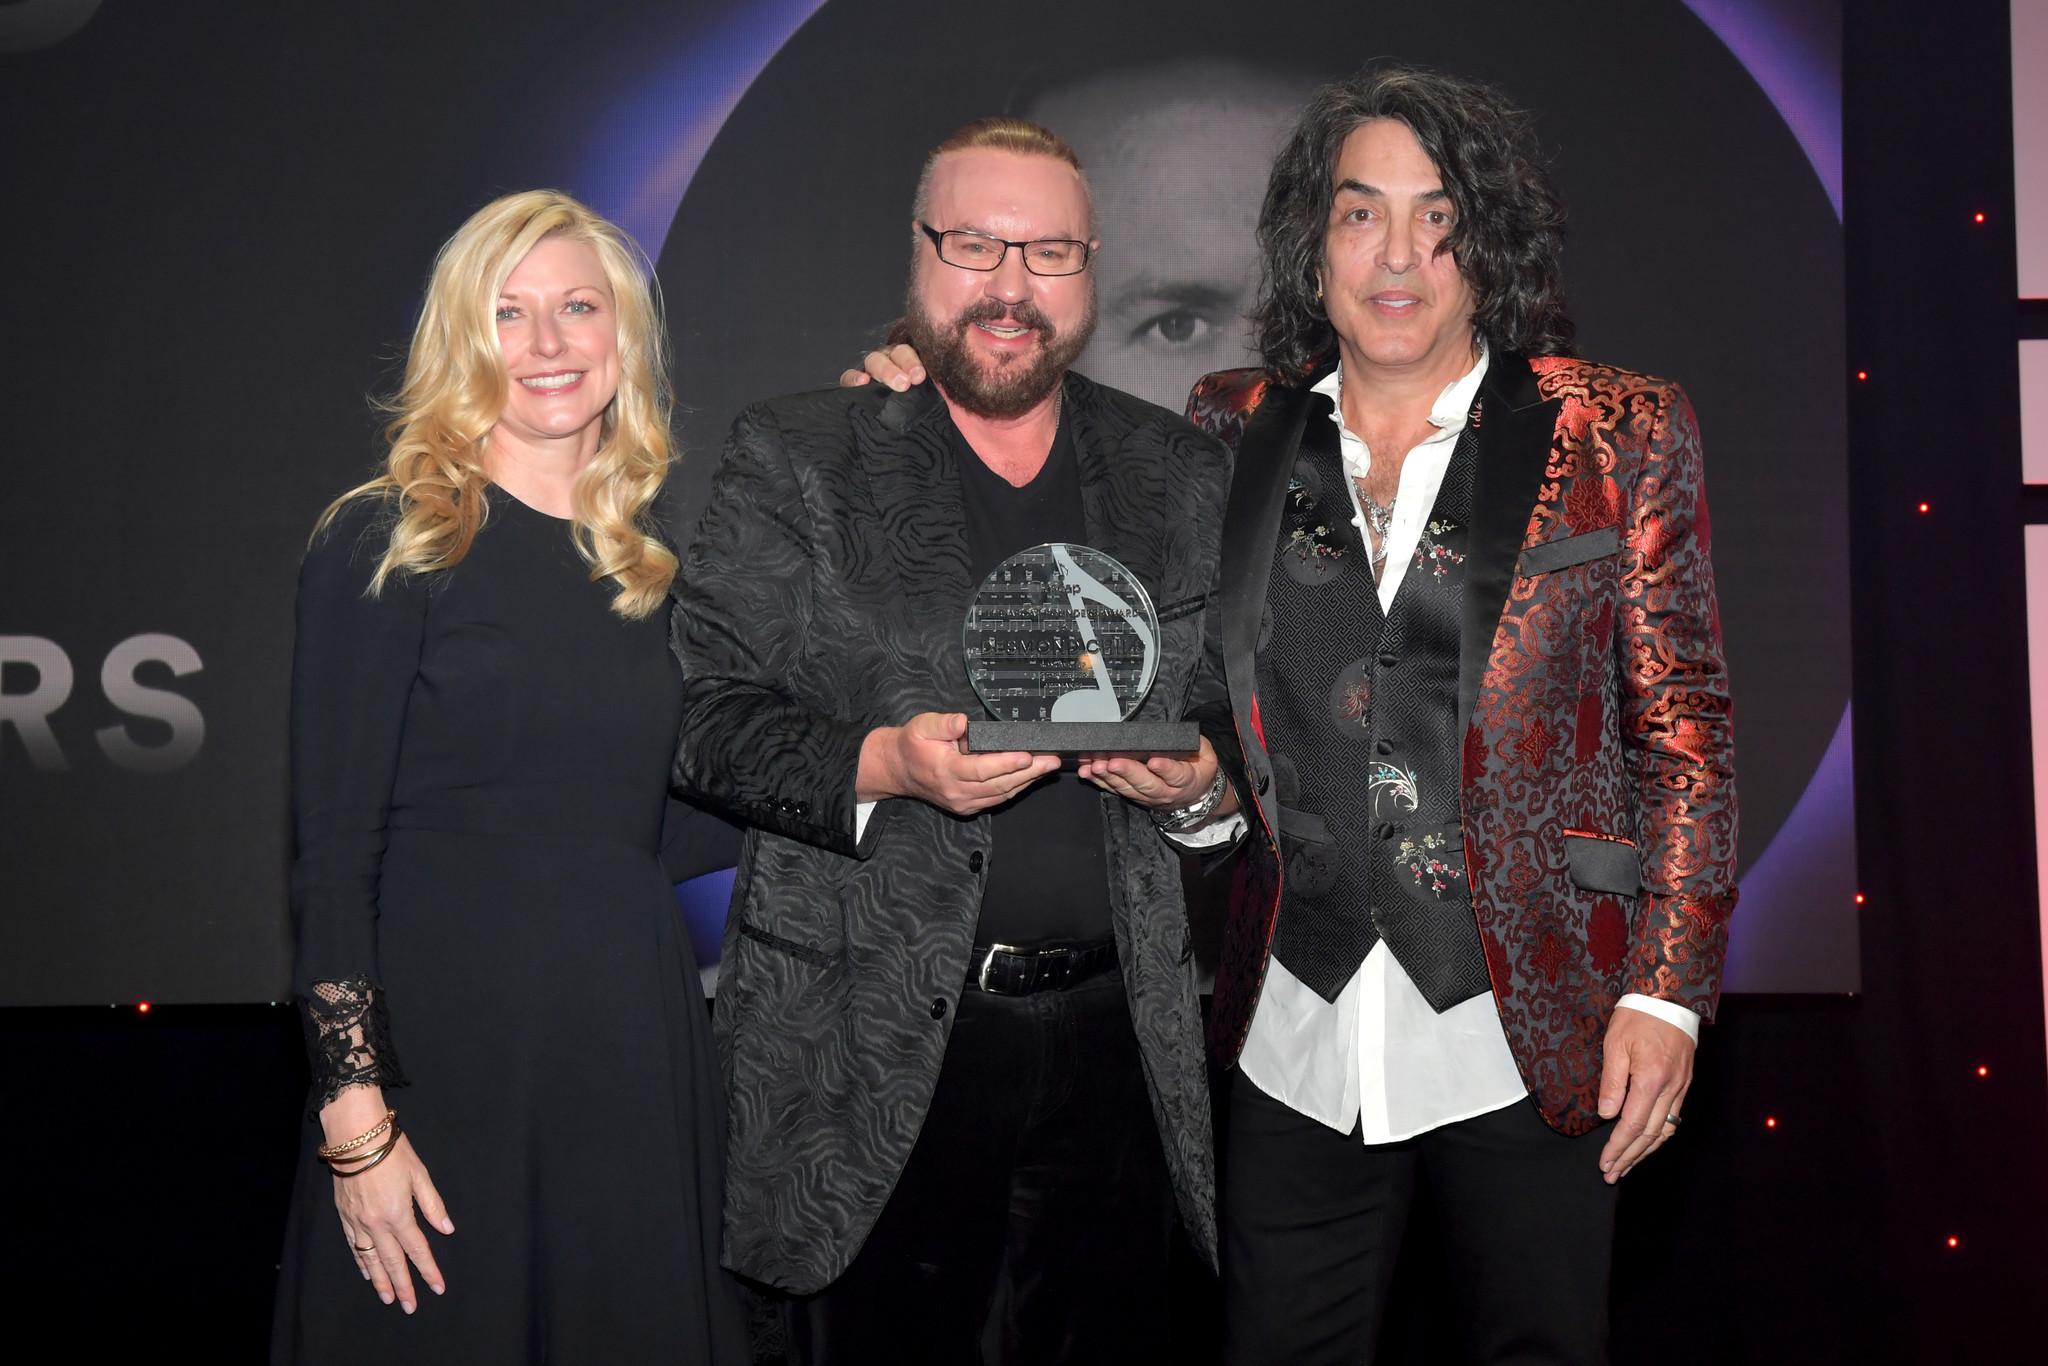 35th Annual ASCAP Pop Music Awards - Sh   ow